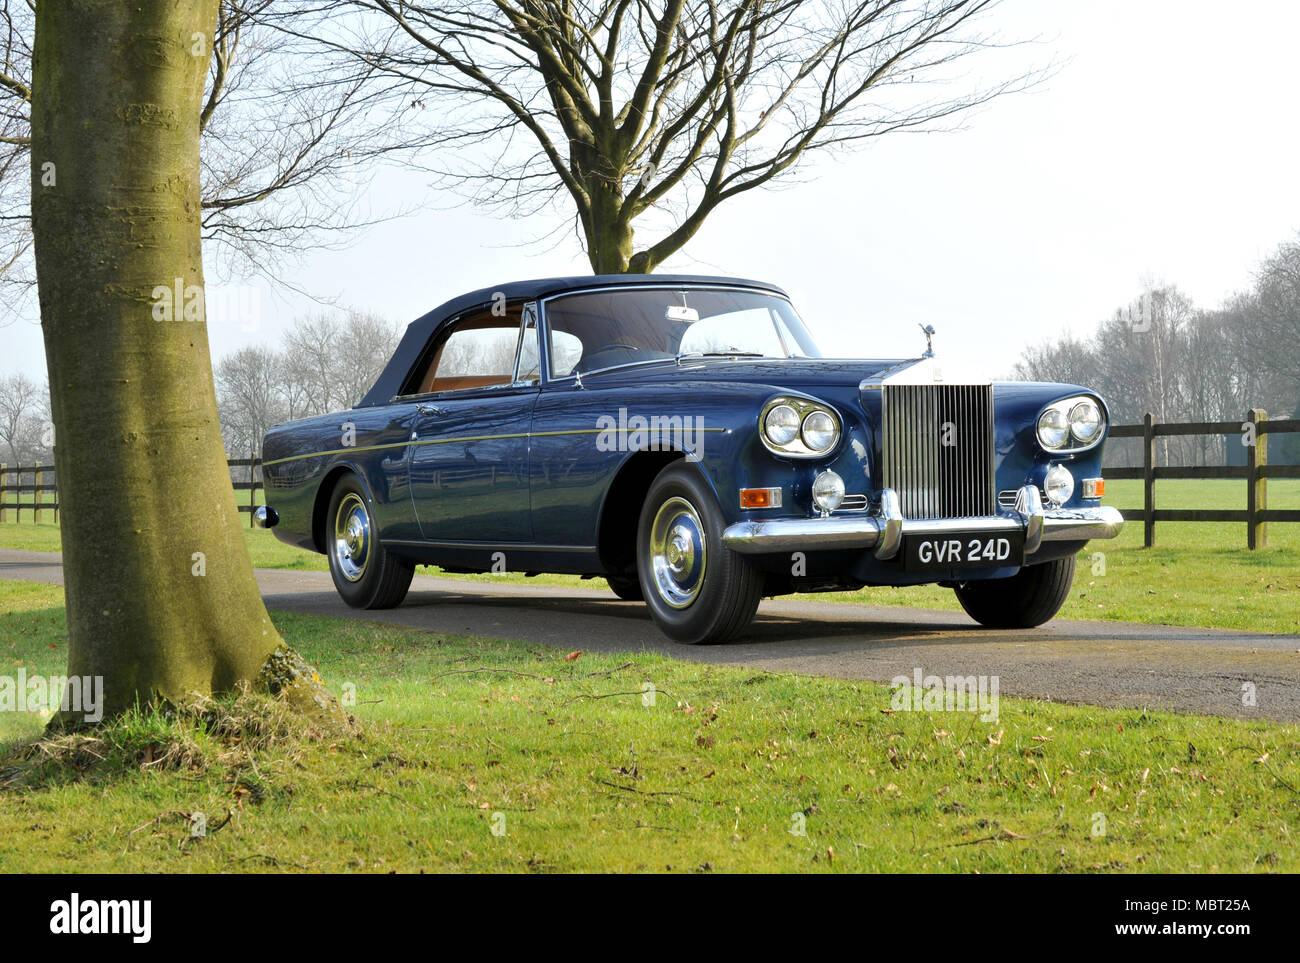 latest fashion hot sale many styles Rolls Royce Silver Cloud III 'Chinese Eye